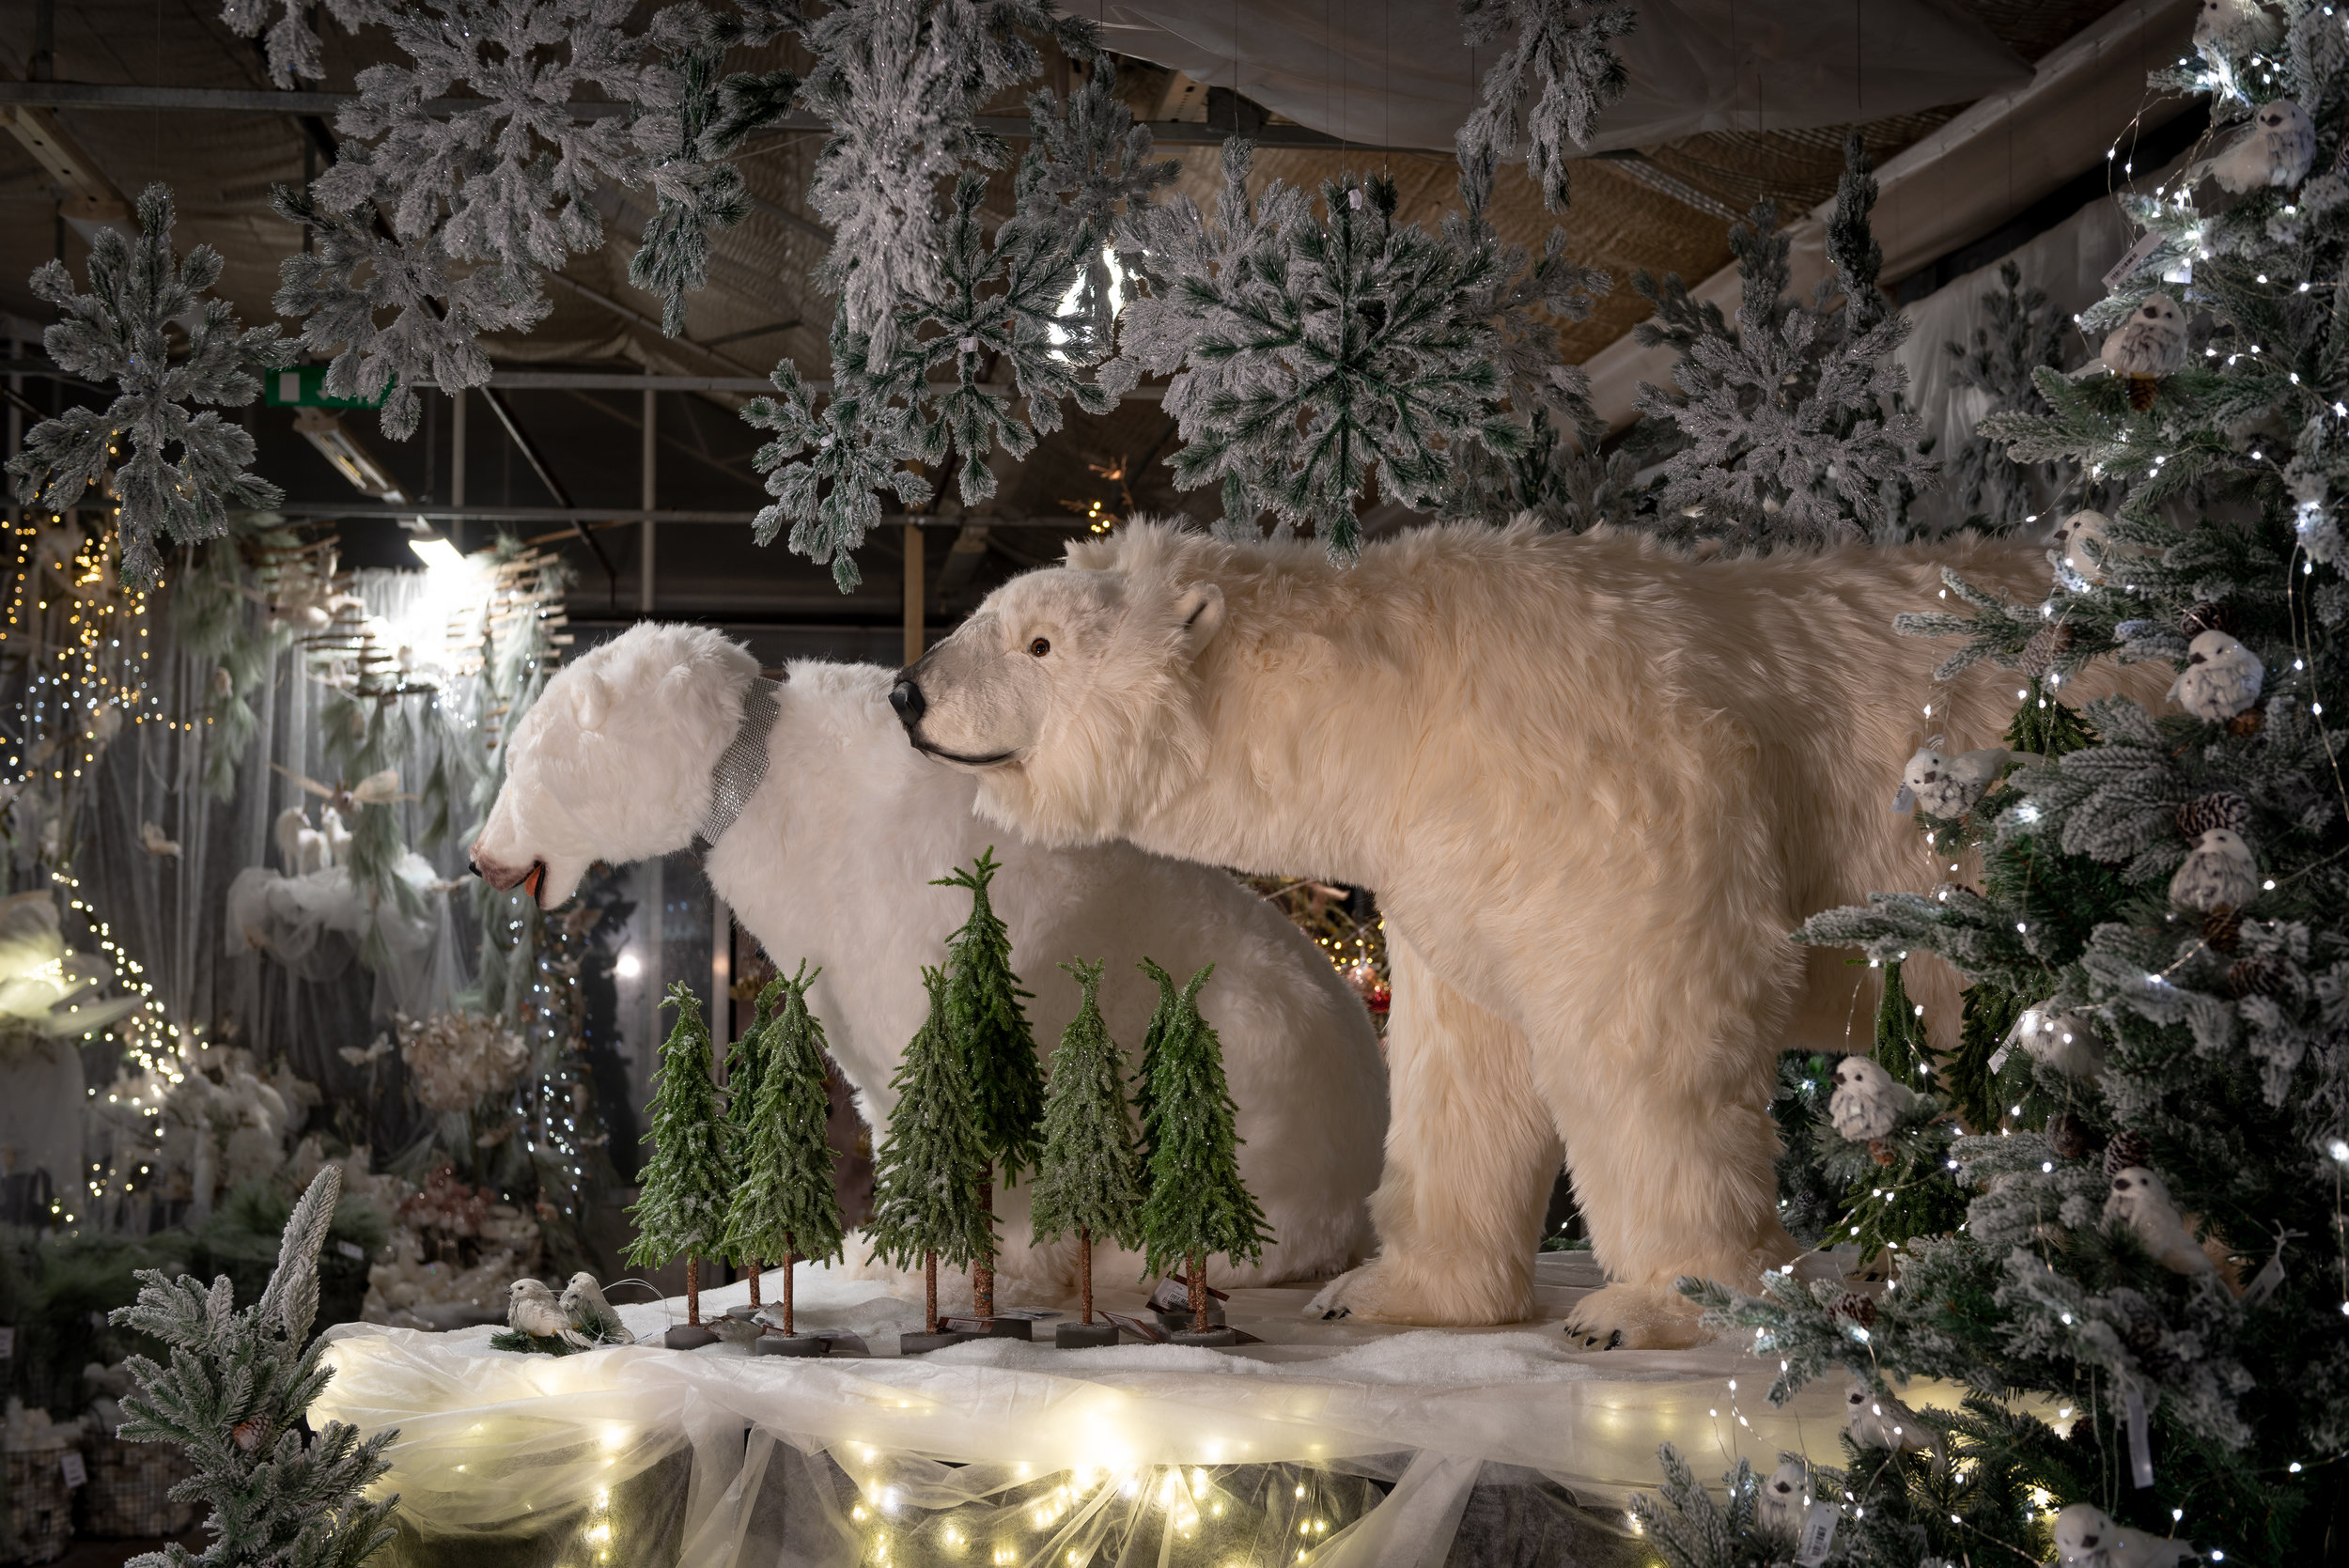 Åsbyhemochträdgård-isbjörnar 2018.jpg